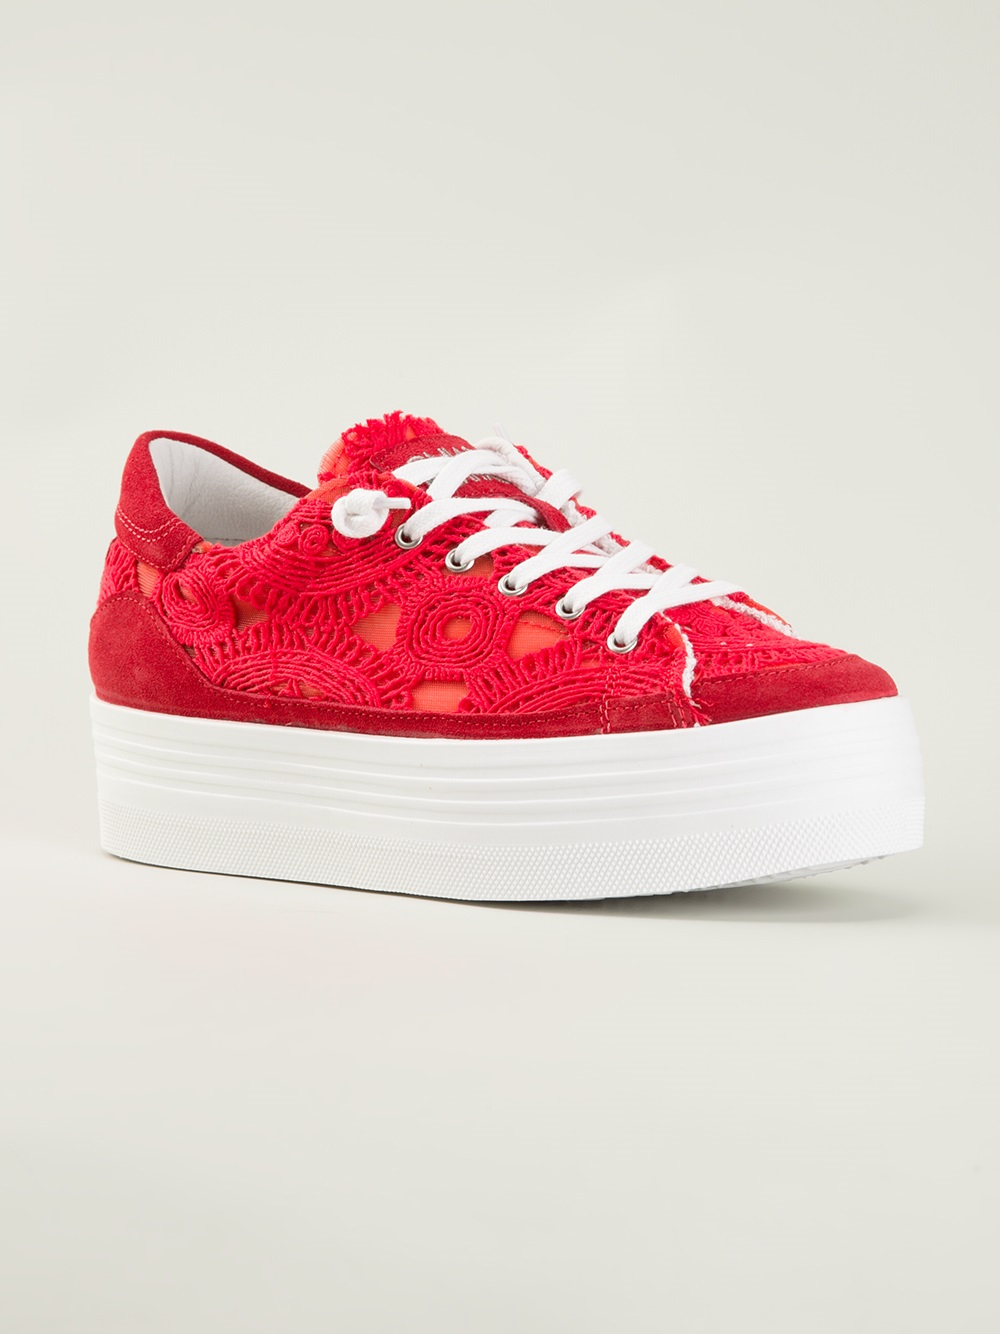 e1449a186e6 Lyst - Chiara Ferragni Platform Sneakers in Red